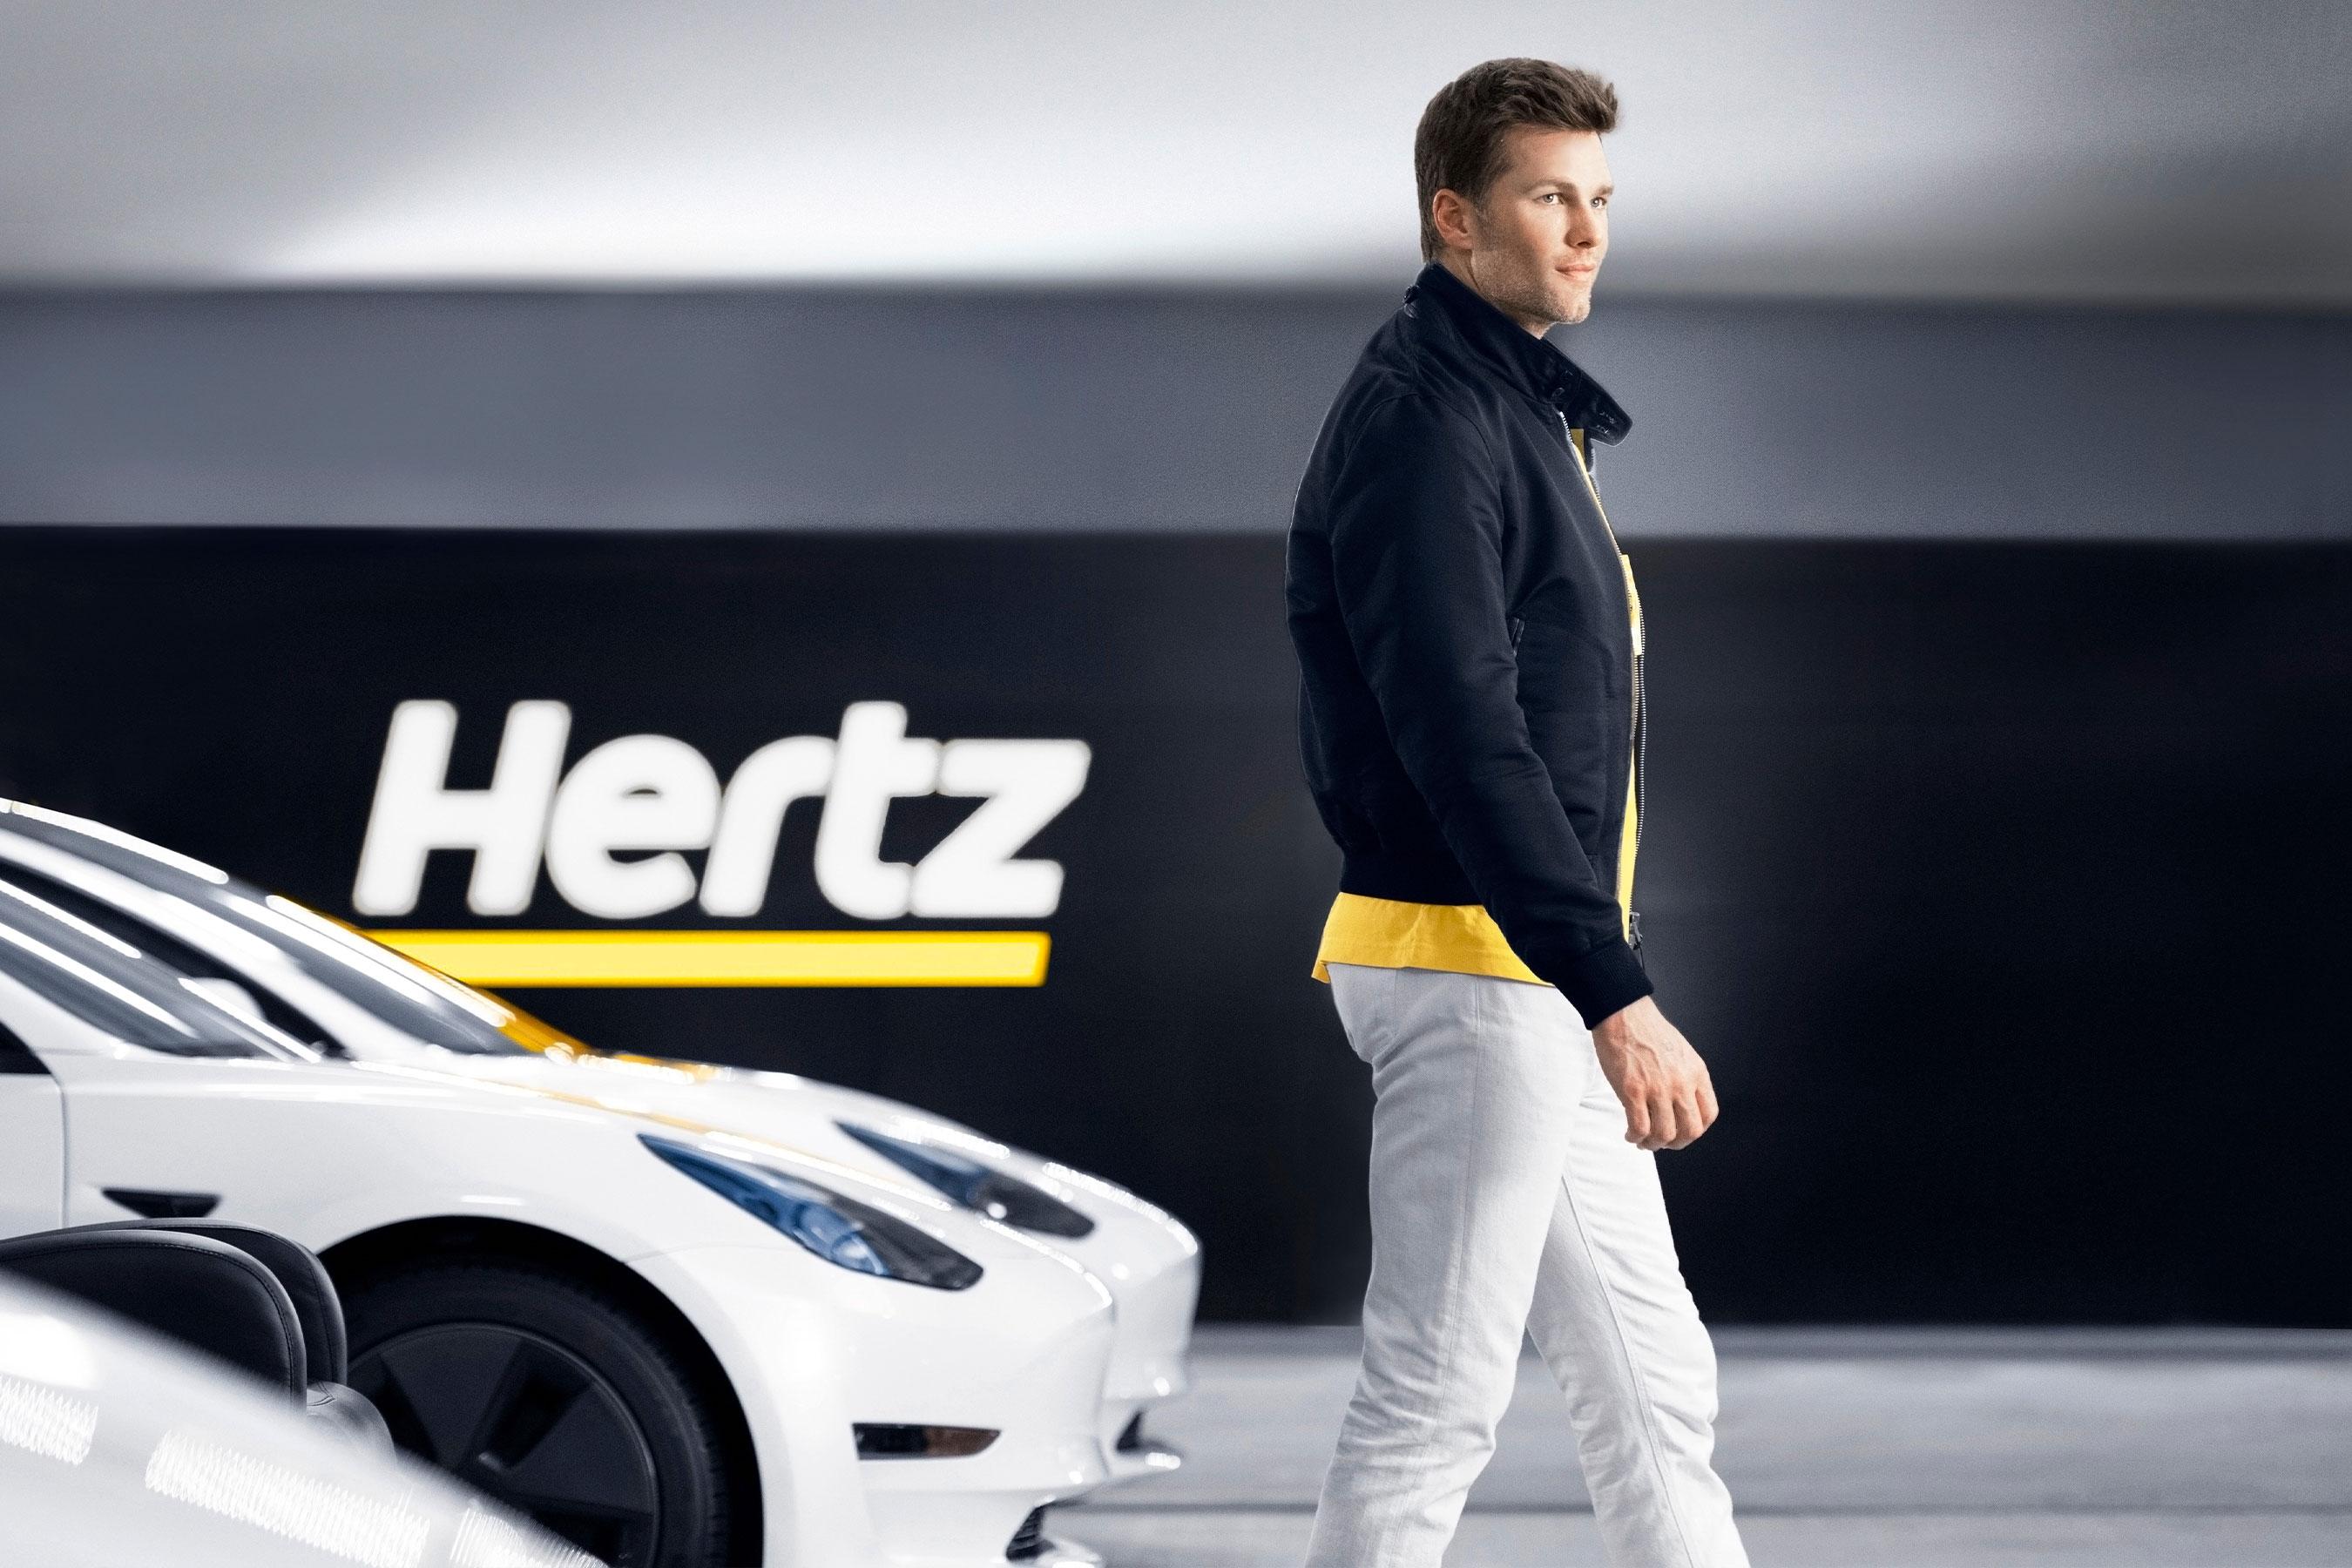 """Hertz, Let's Go!"" campaign featuring seven-time Super Bowl champion Tom Brady. Photo by E.R. Davidson"